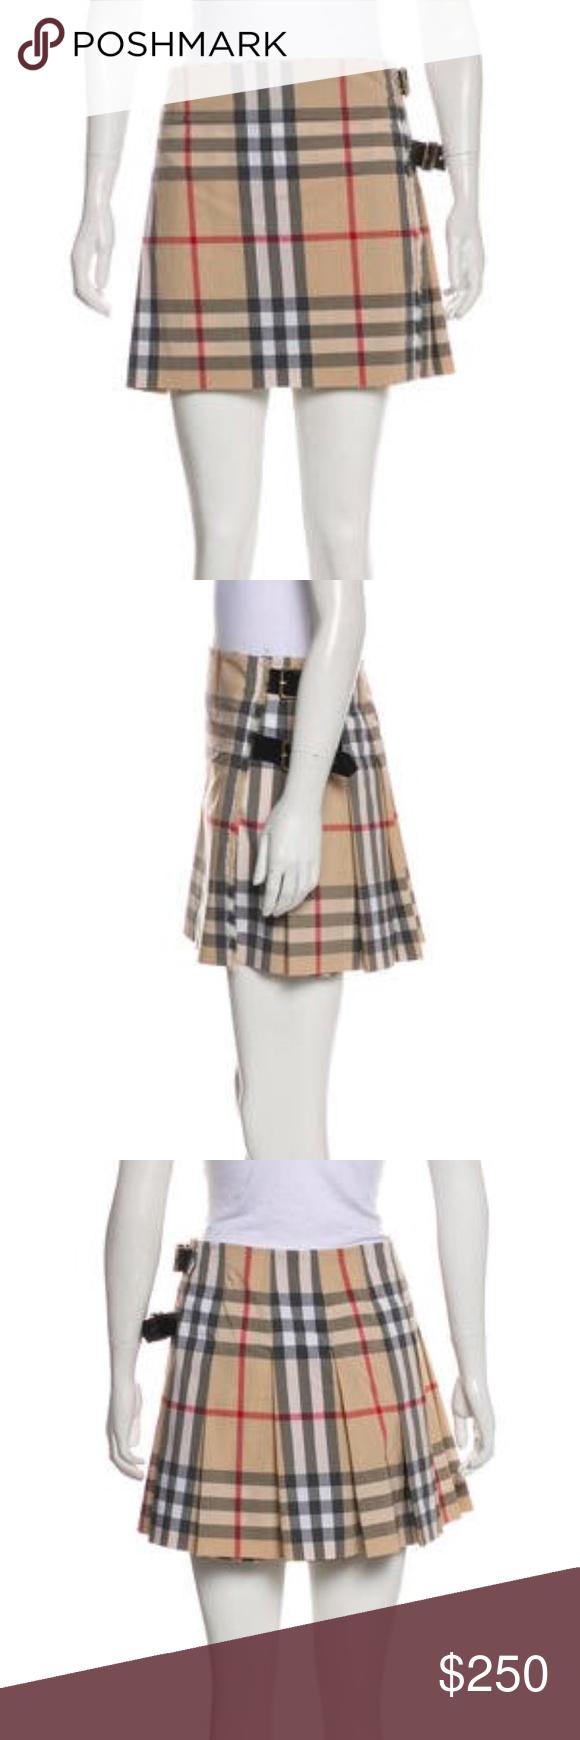 eb3d0938fc Burberry Plaid nova check Skirt kilt US 8 UK 10 This is a 100% authentic  nova check plaid mini wrap skirt kilt from Burberry in US size 8, UK size  10.